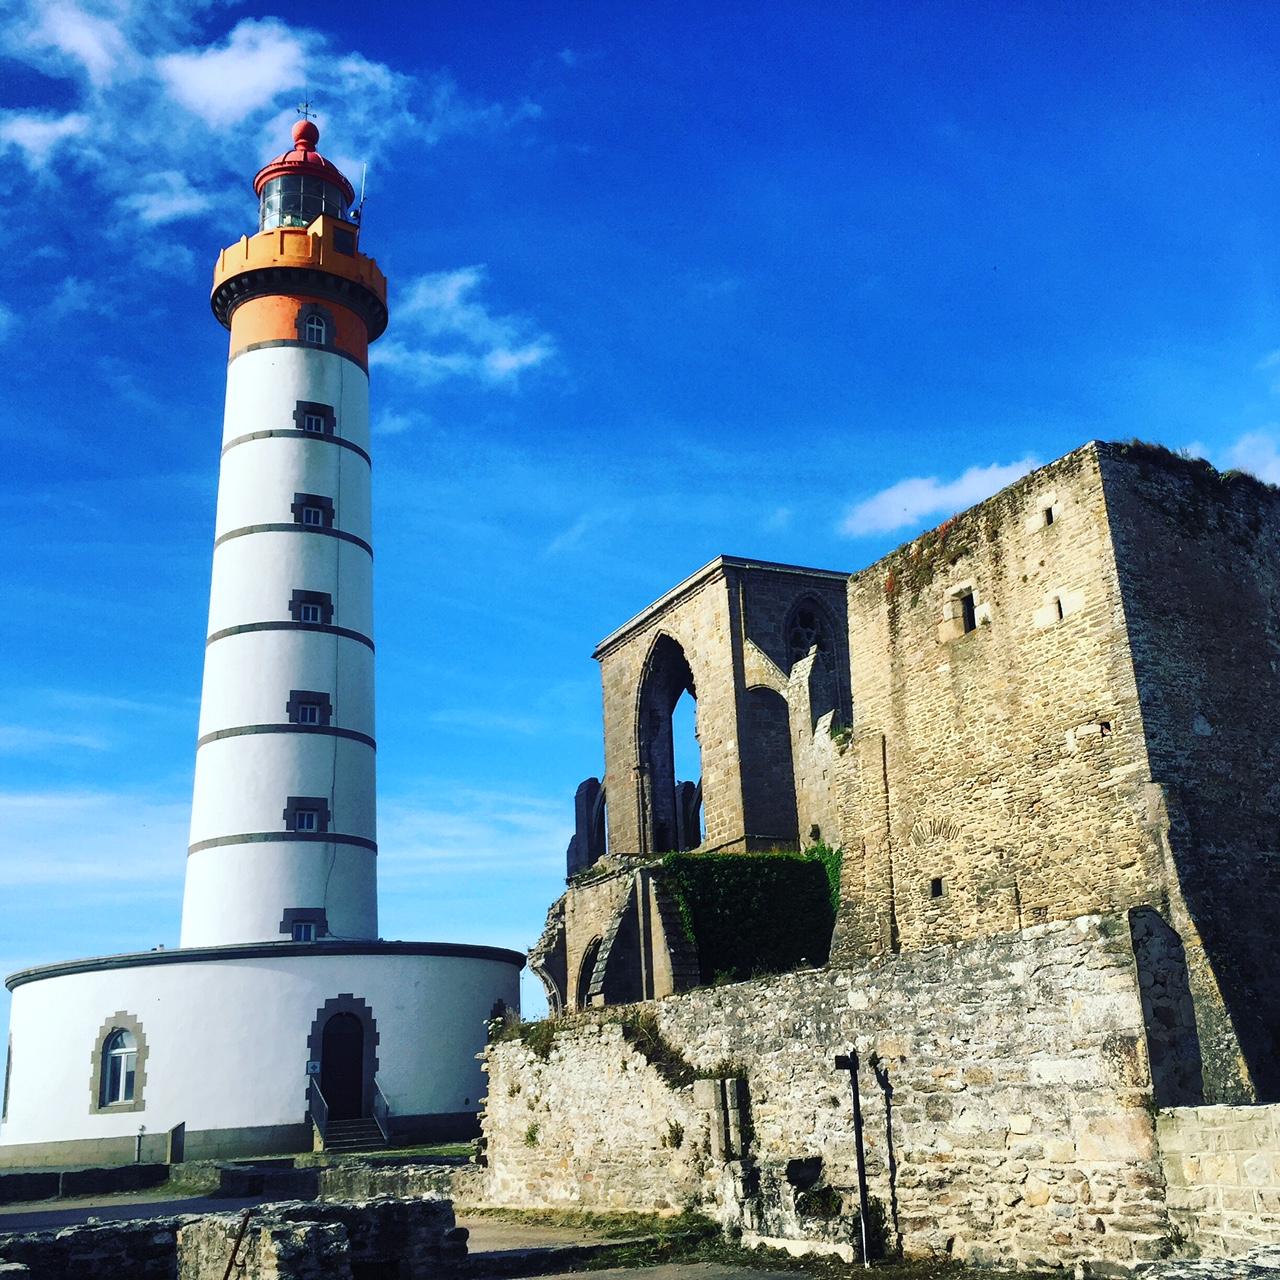 Sites de rencontres bretons